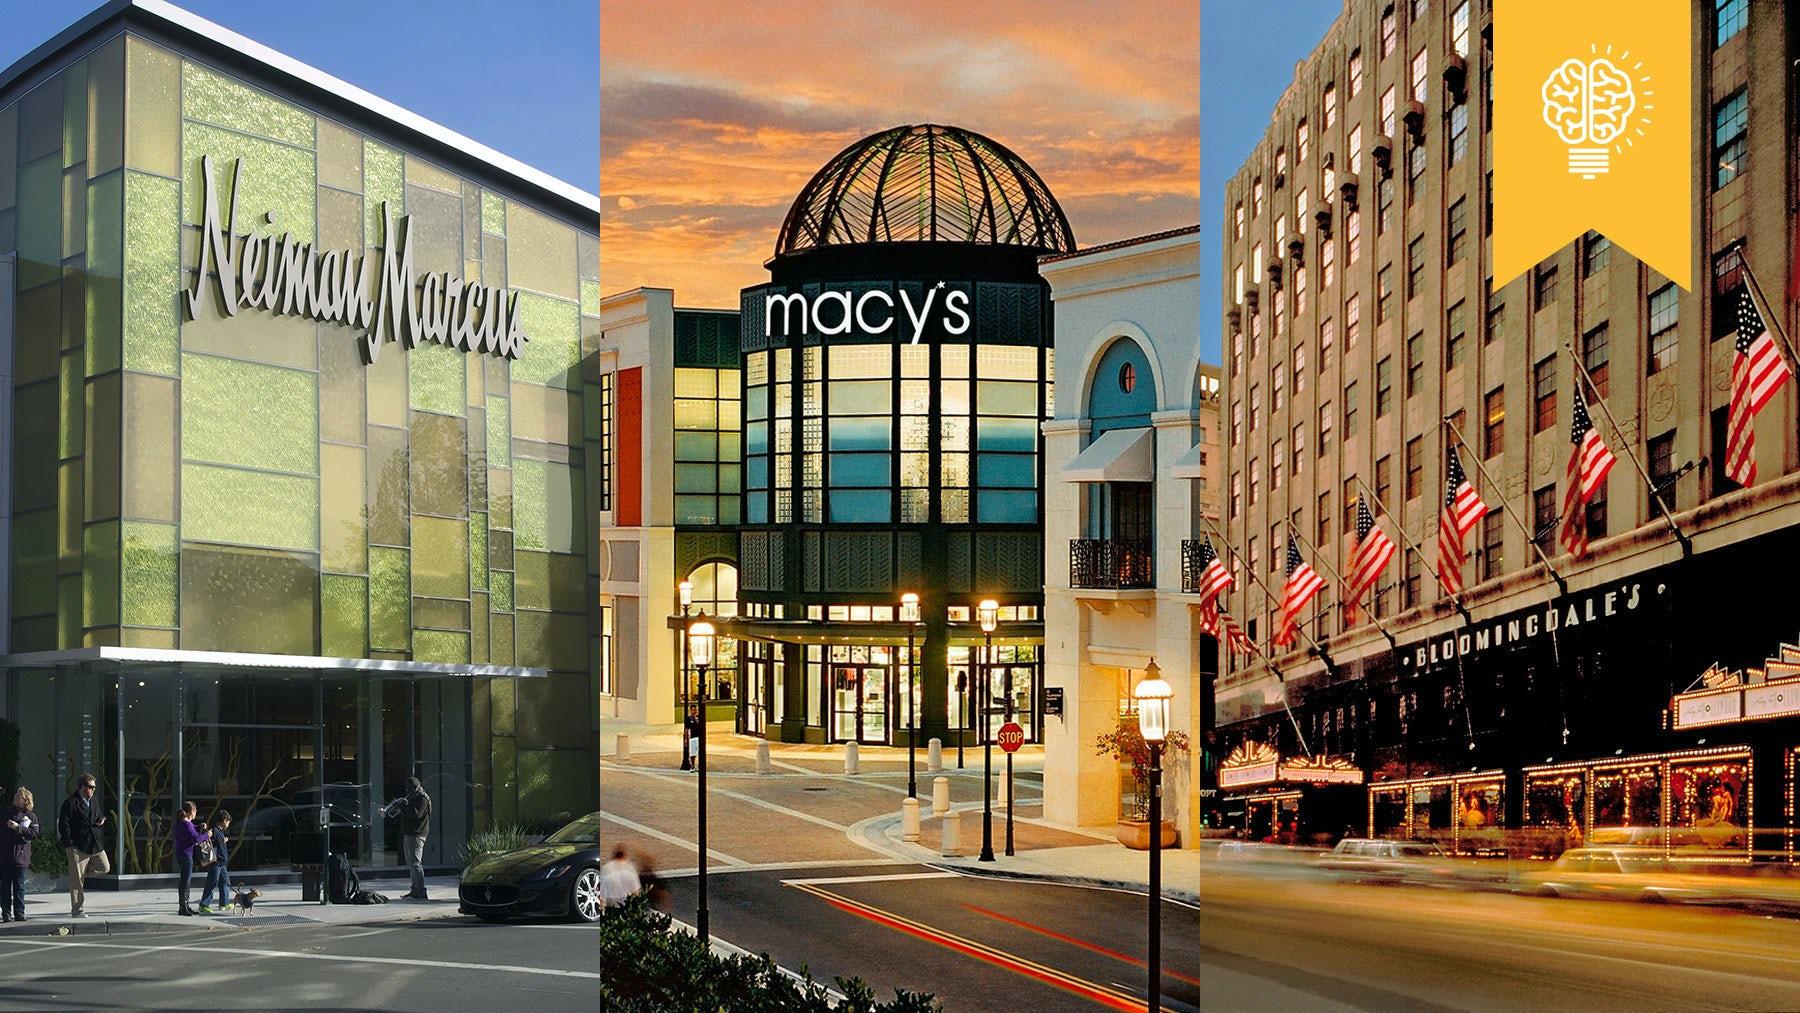 Source (L-R): Shutterstock, Macy's Inc., Macy's Inc.